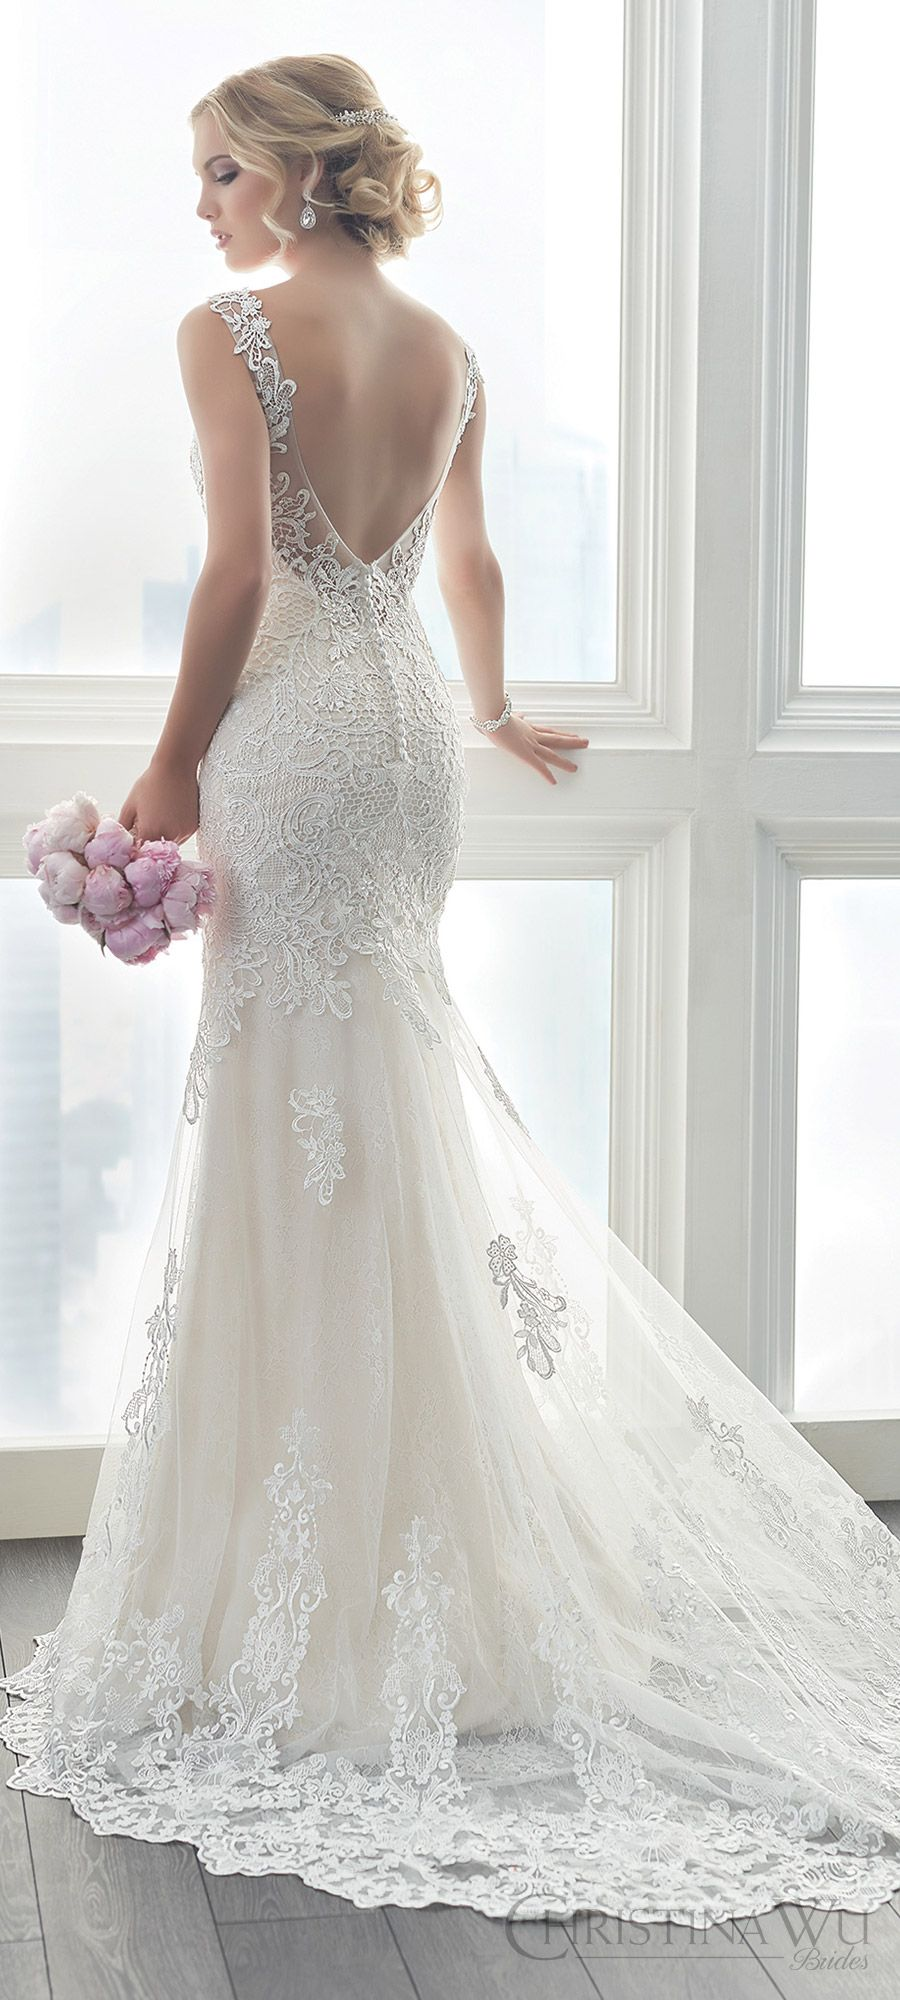 Lace v neck wedding dress  christina wu brides spring  bridal sleeveless illusion straps